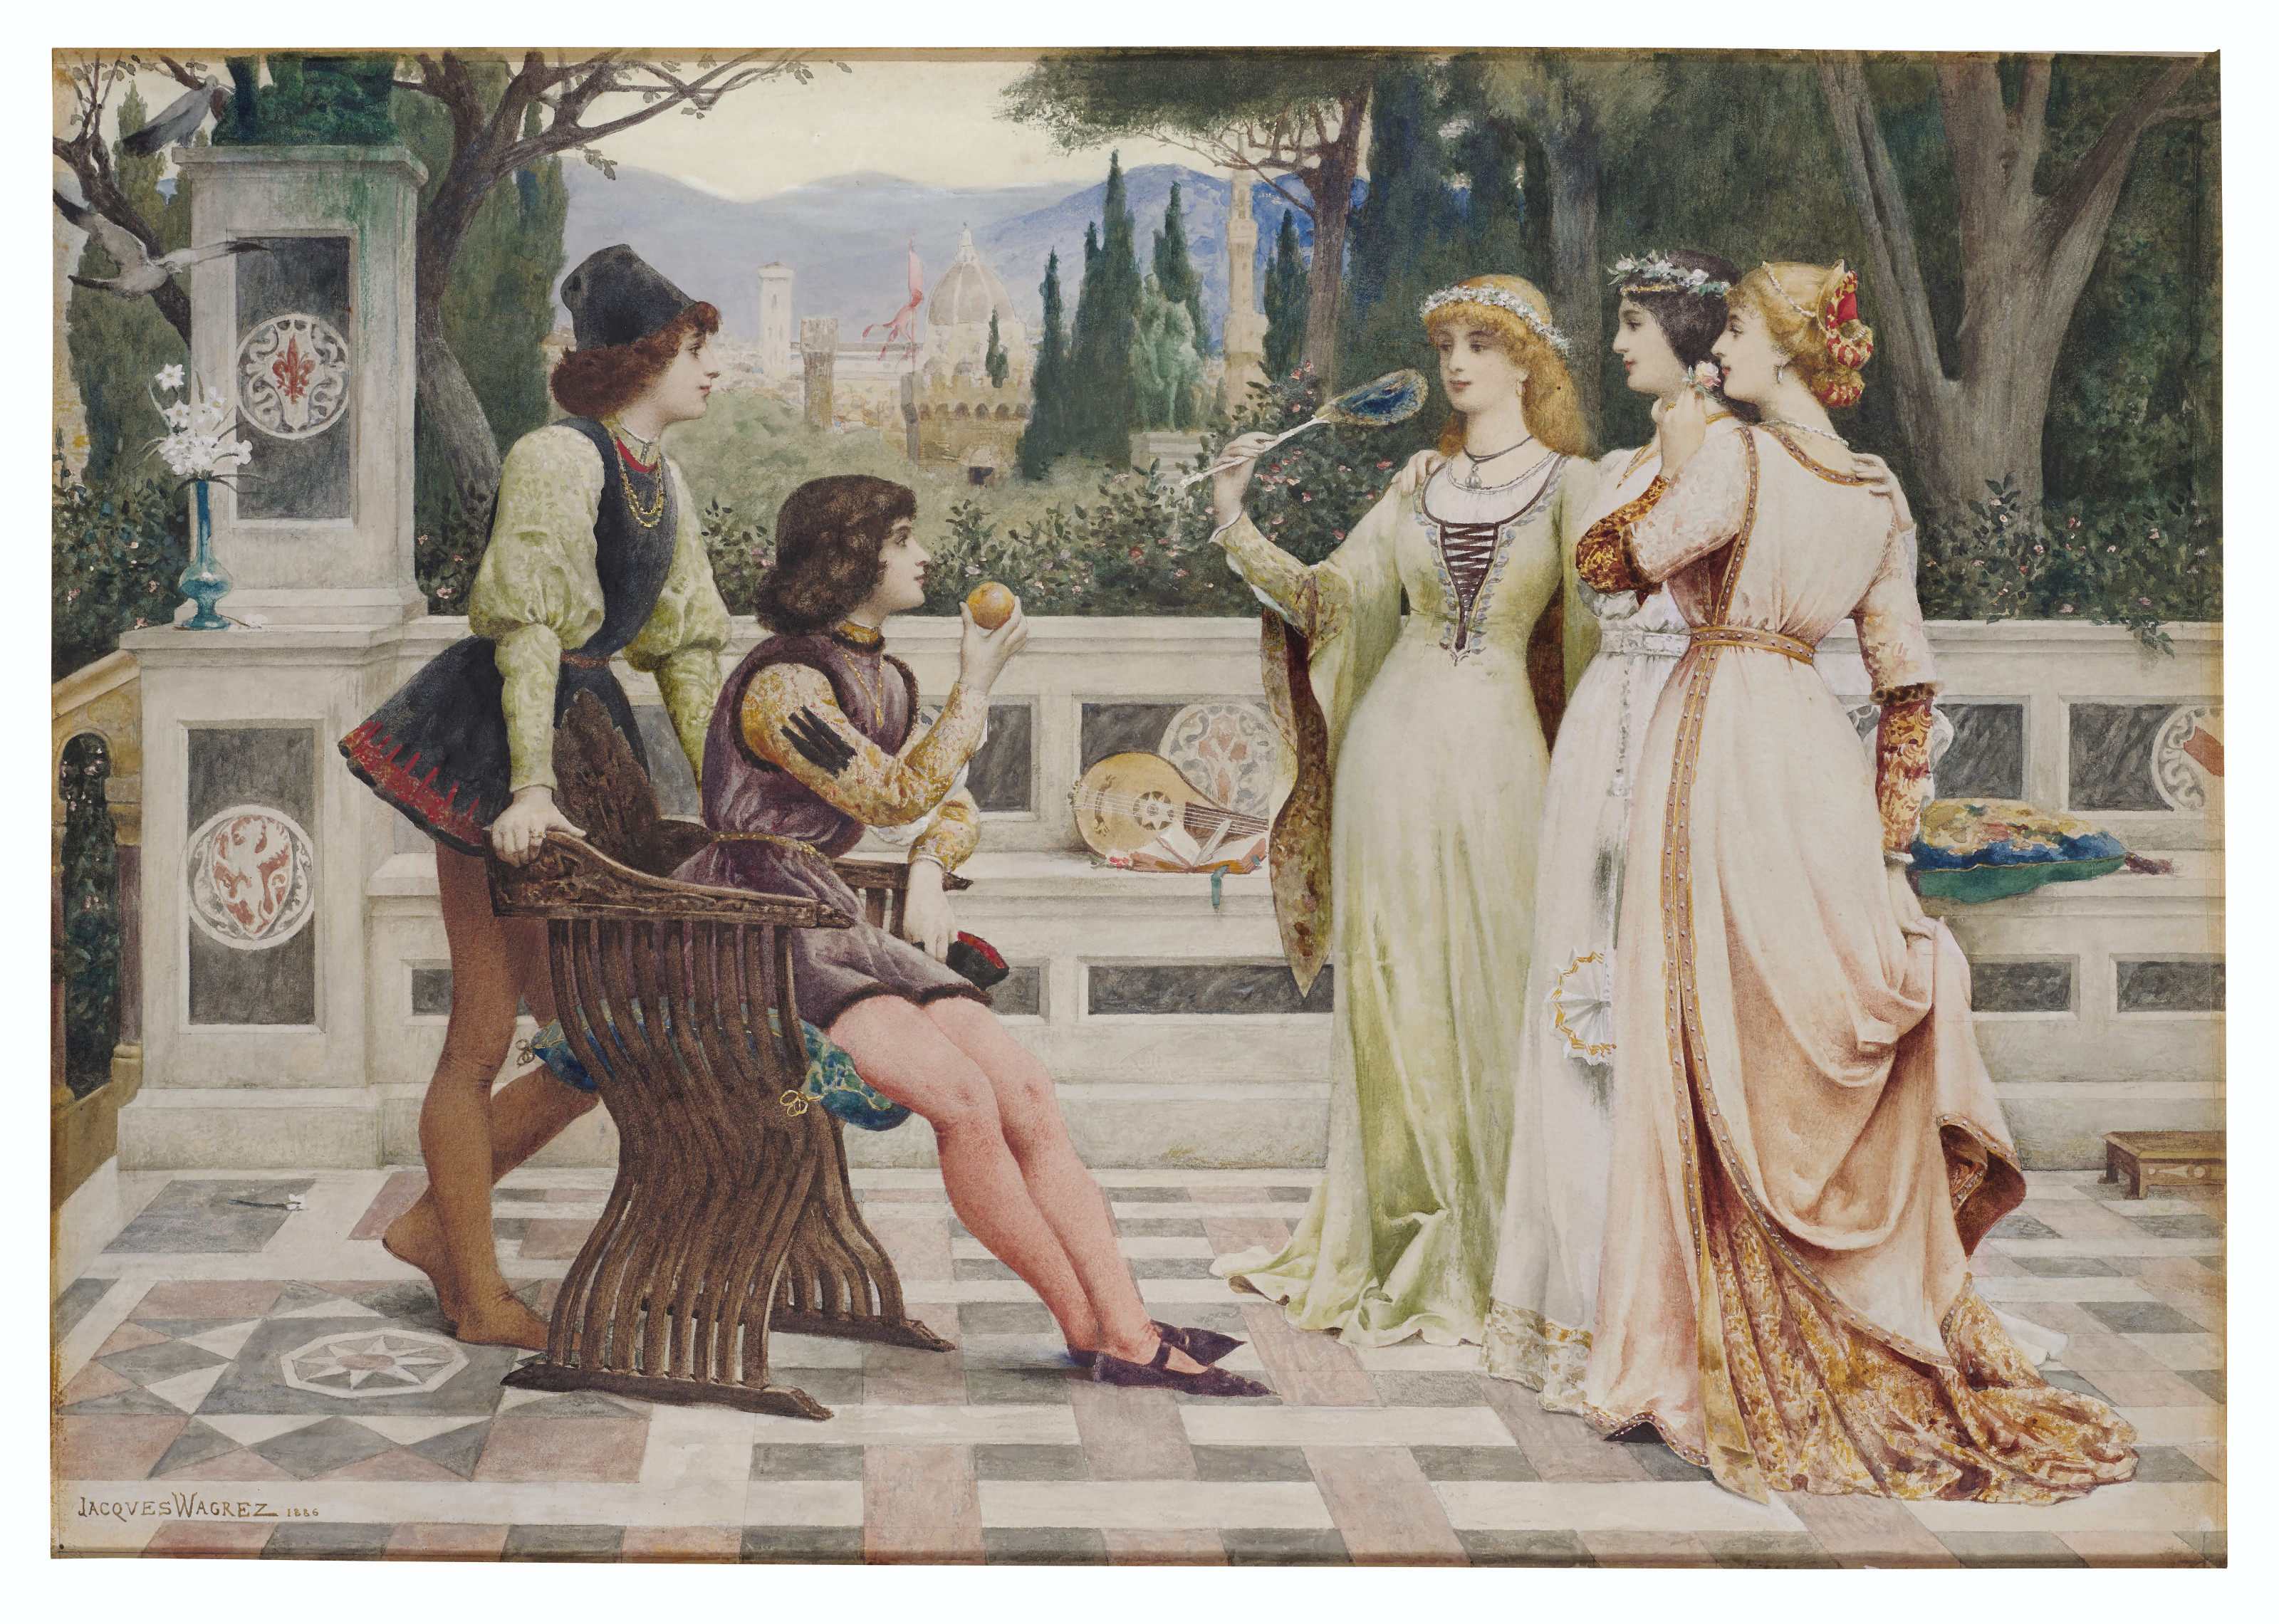 laclefdescoeurs: The Judgement of Paris, 1812, Guillaume